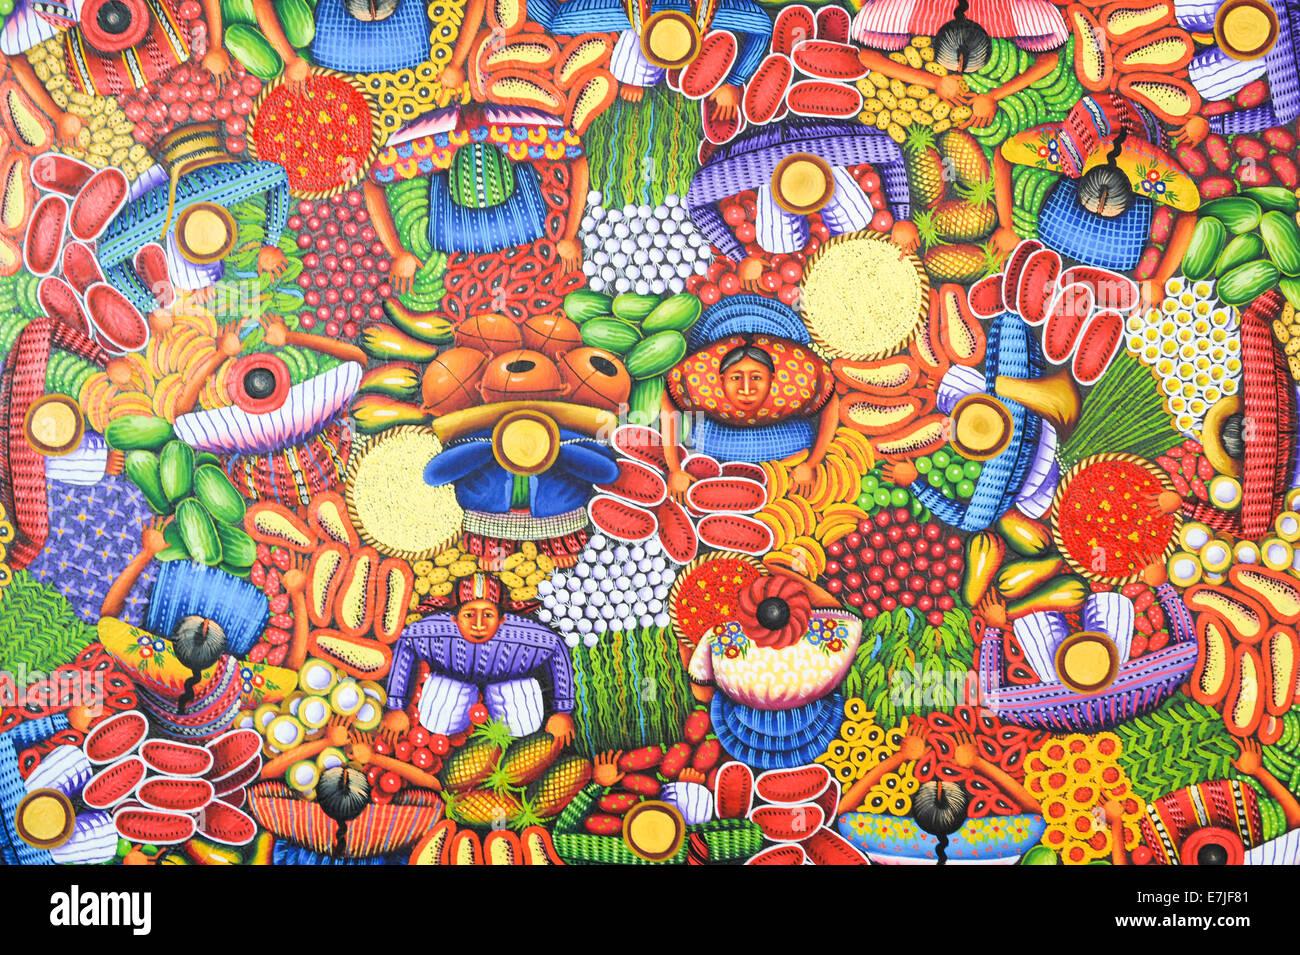 Guatemala, Central America, San Juan, artwork, Atitlan, colourful, la Laguna, Maya, painting, colourful, - Stock Image